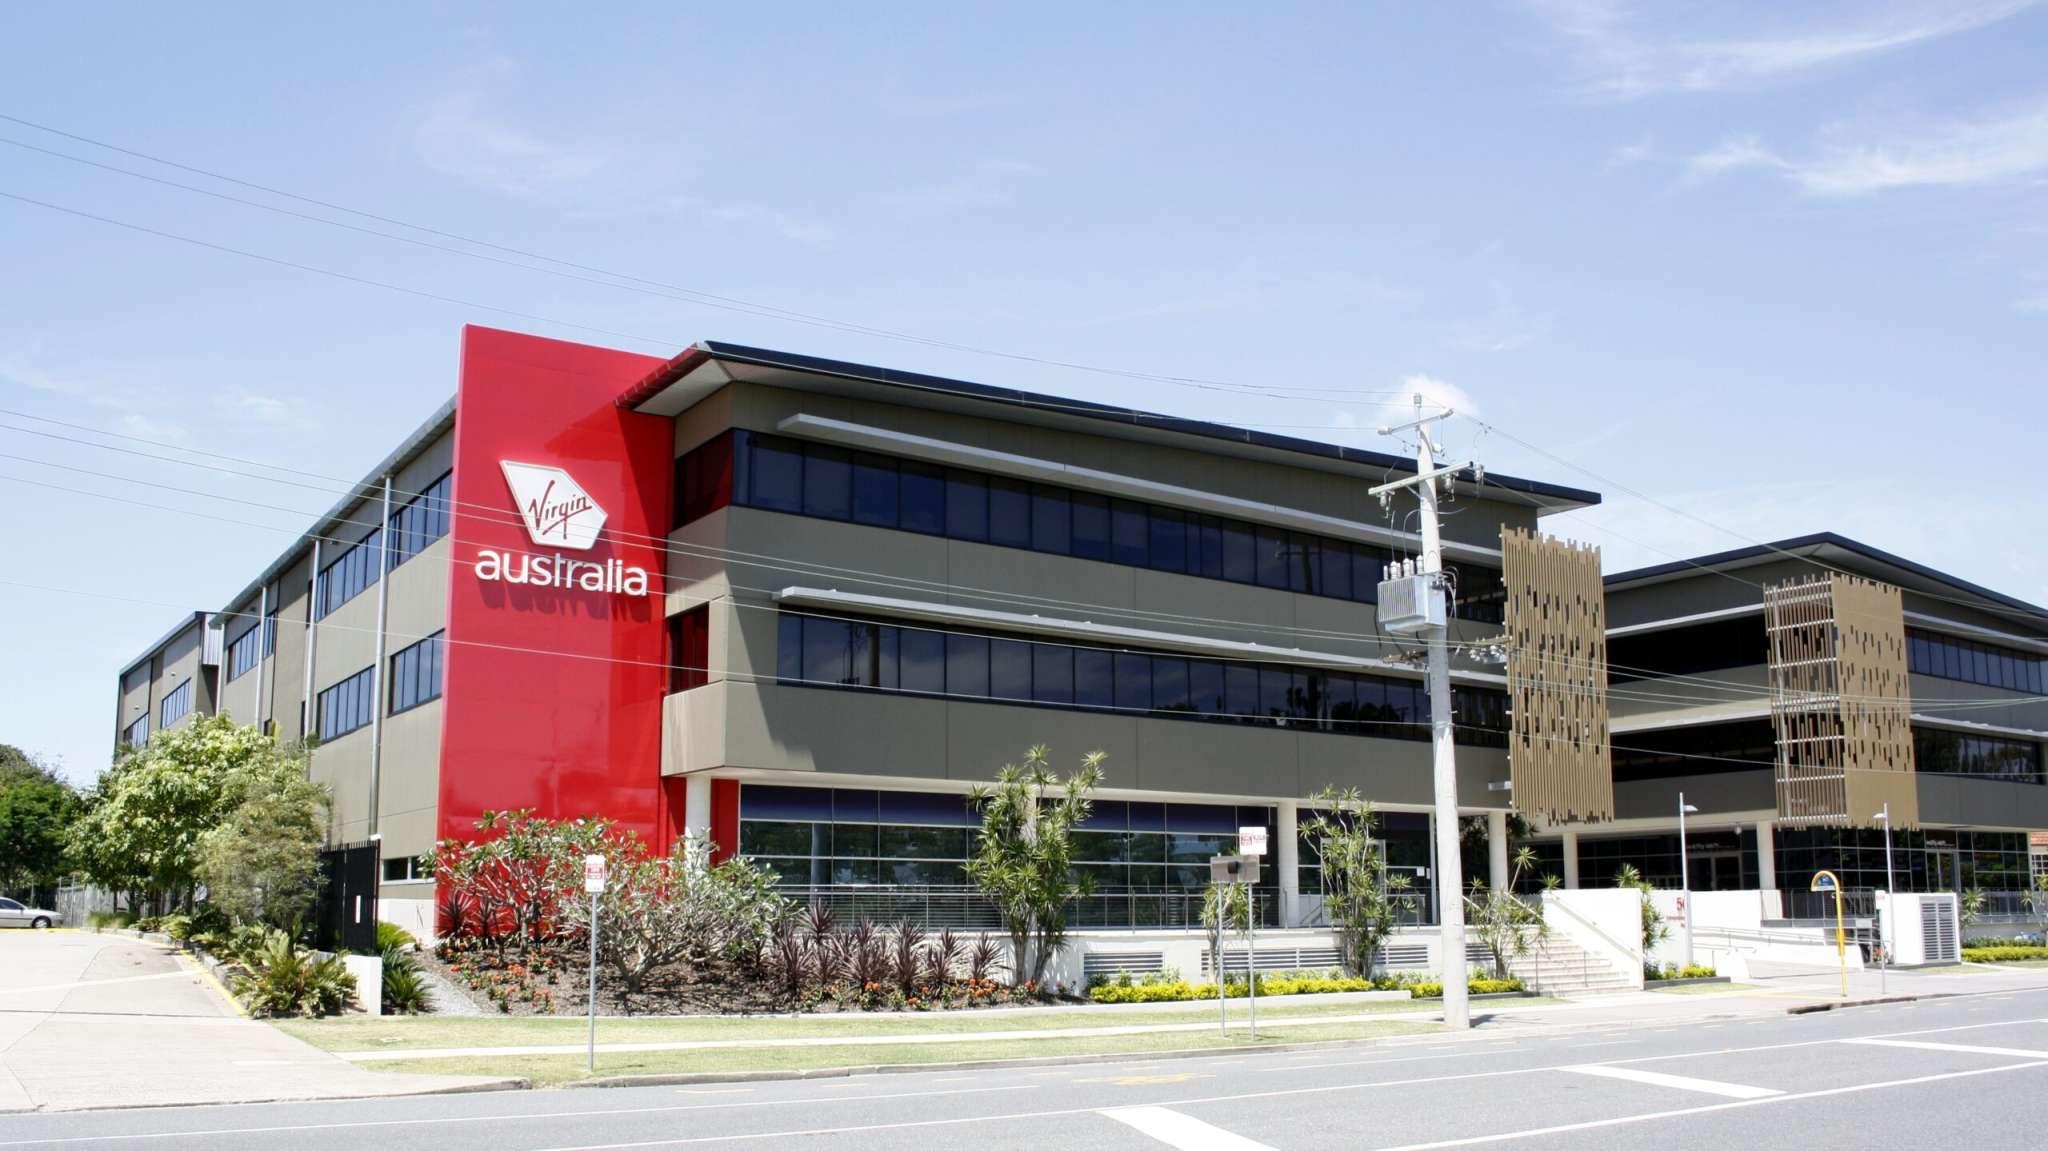 Virgin Australia Office Address | Customer Service Number